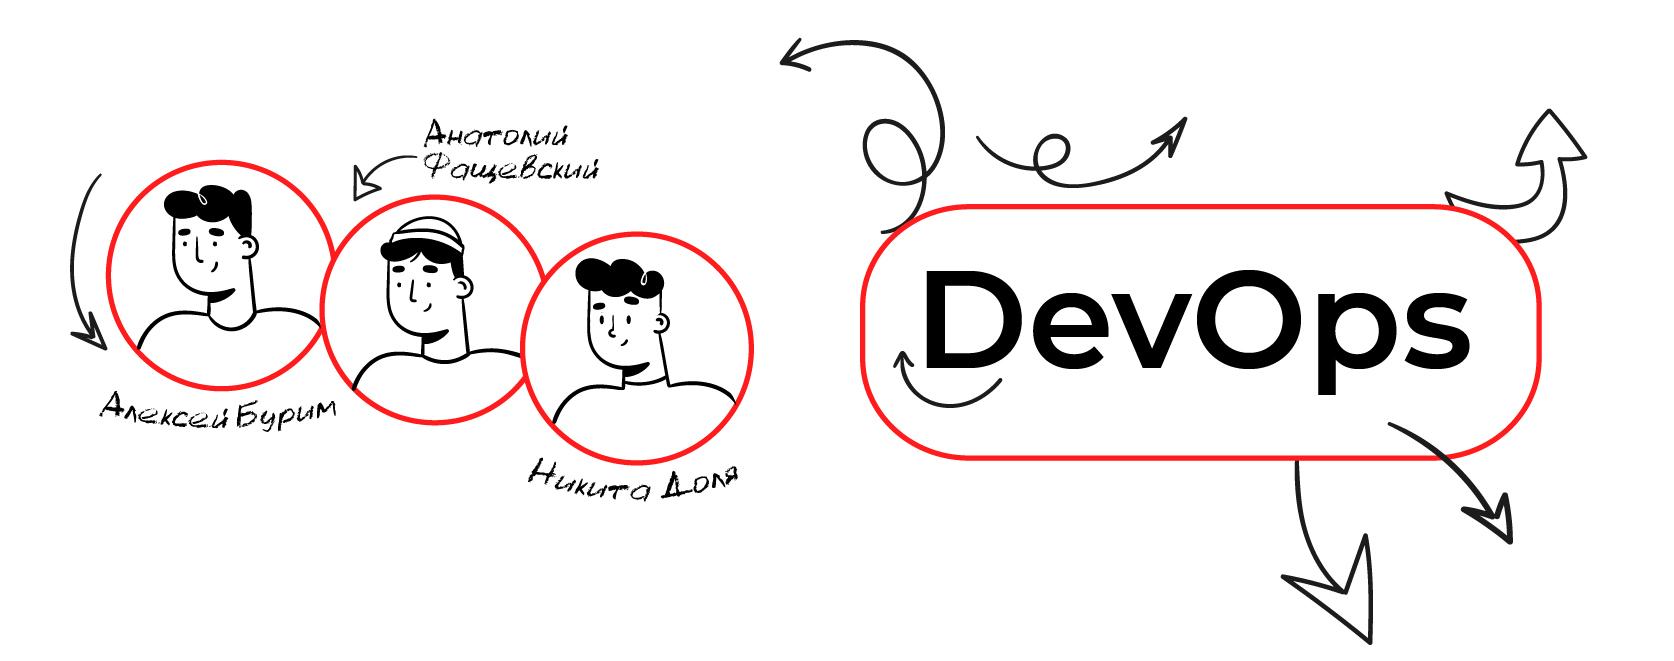 Диалоги о DevOps инженерах в iTechArt